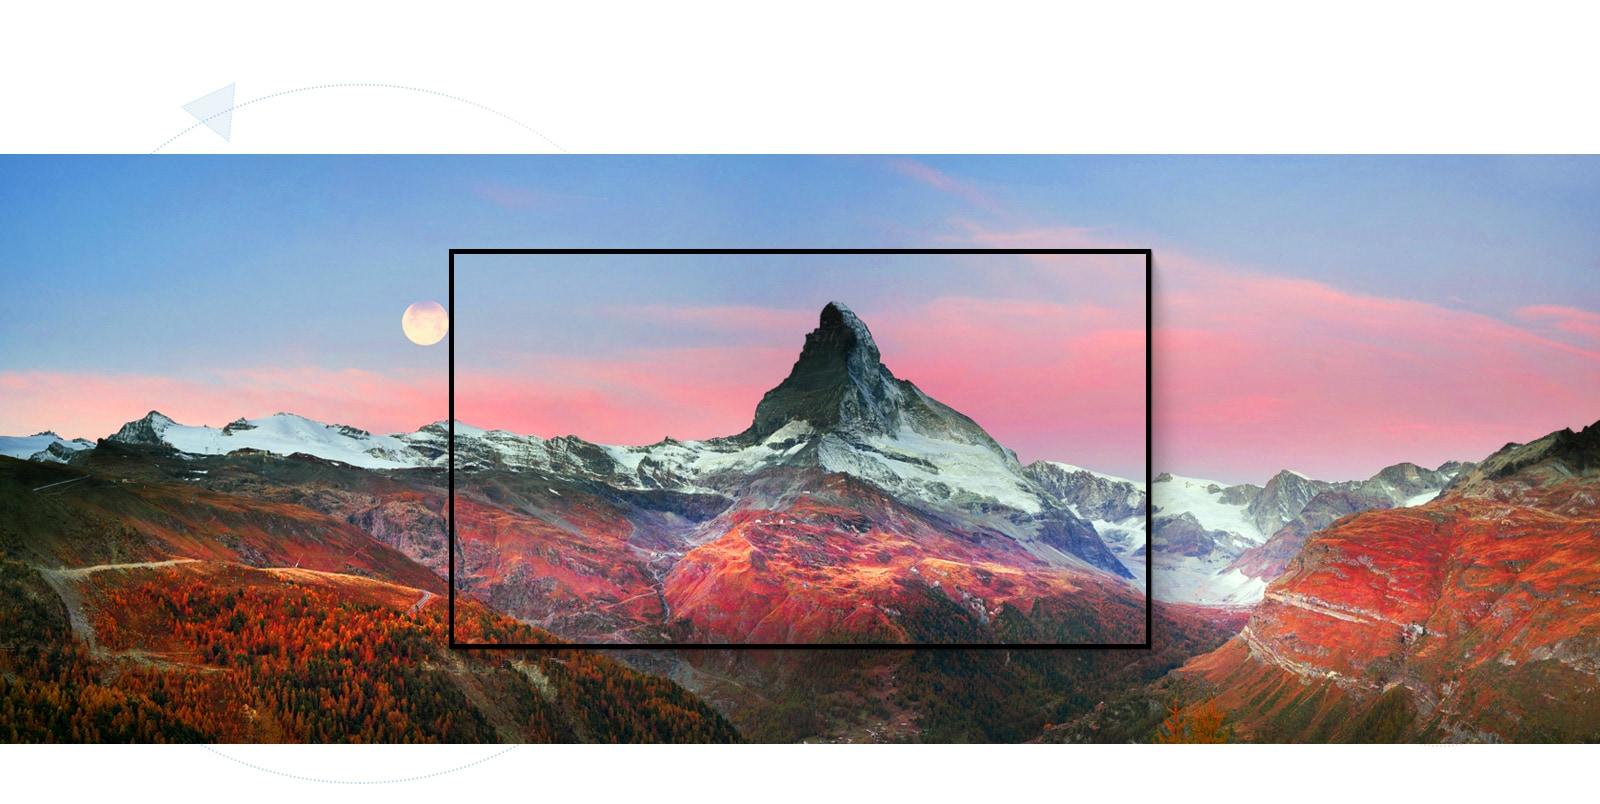 Okvir u kojem se nalazi krajolik veličanstvene planine (reproduciraj videozapis)